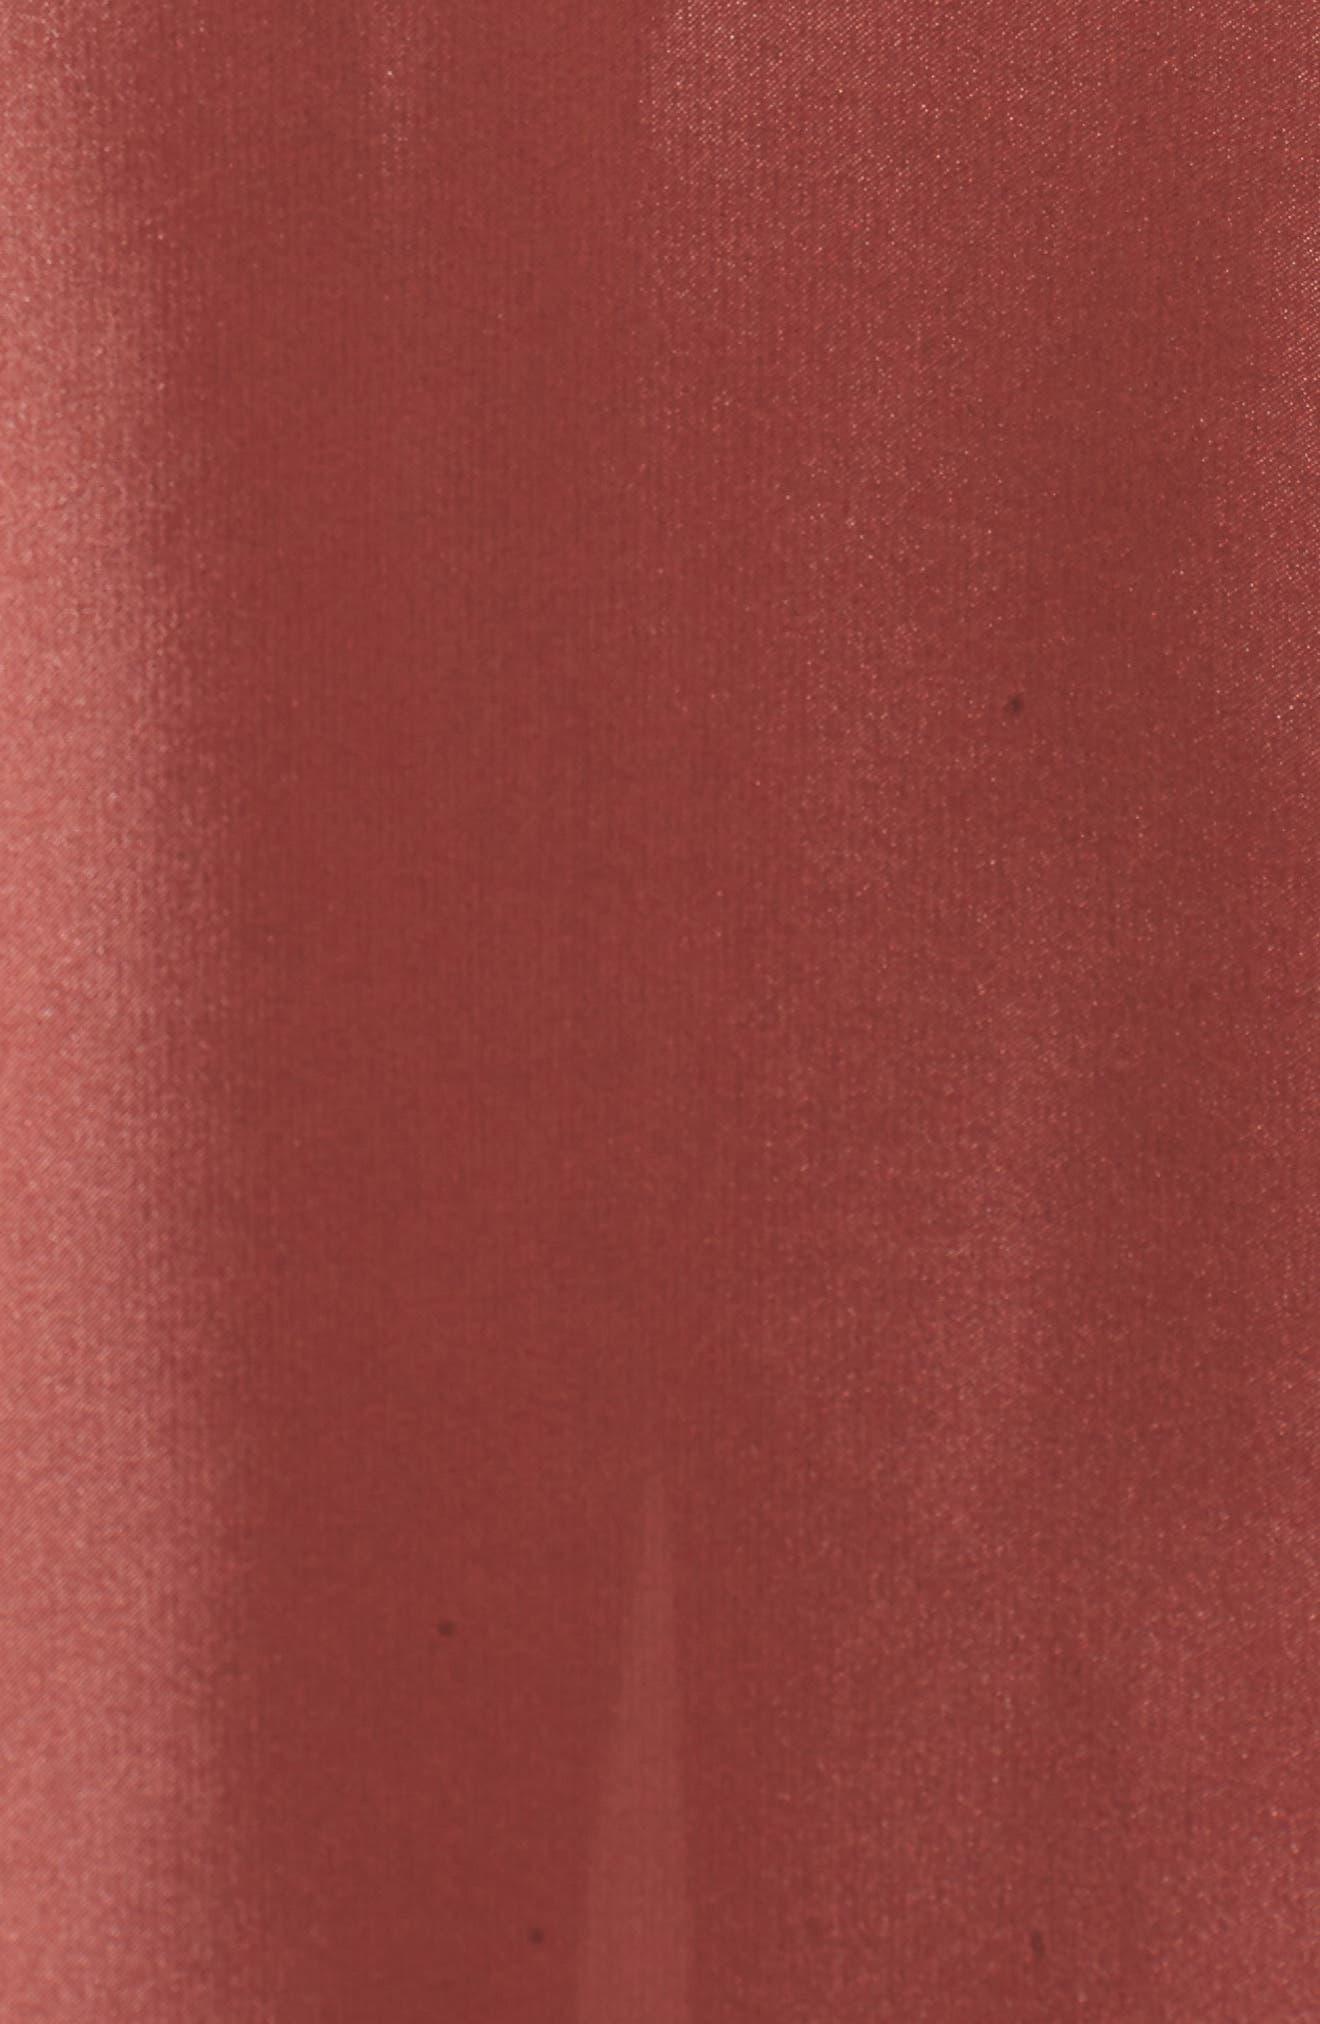 Icy Shores Maxi Dress,                             Alternate thumbnail 6, color,                             Multi